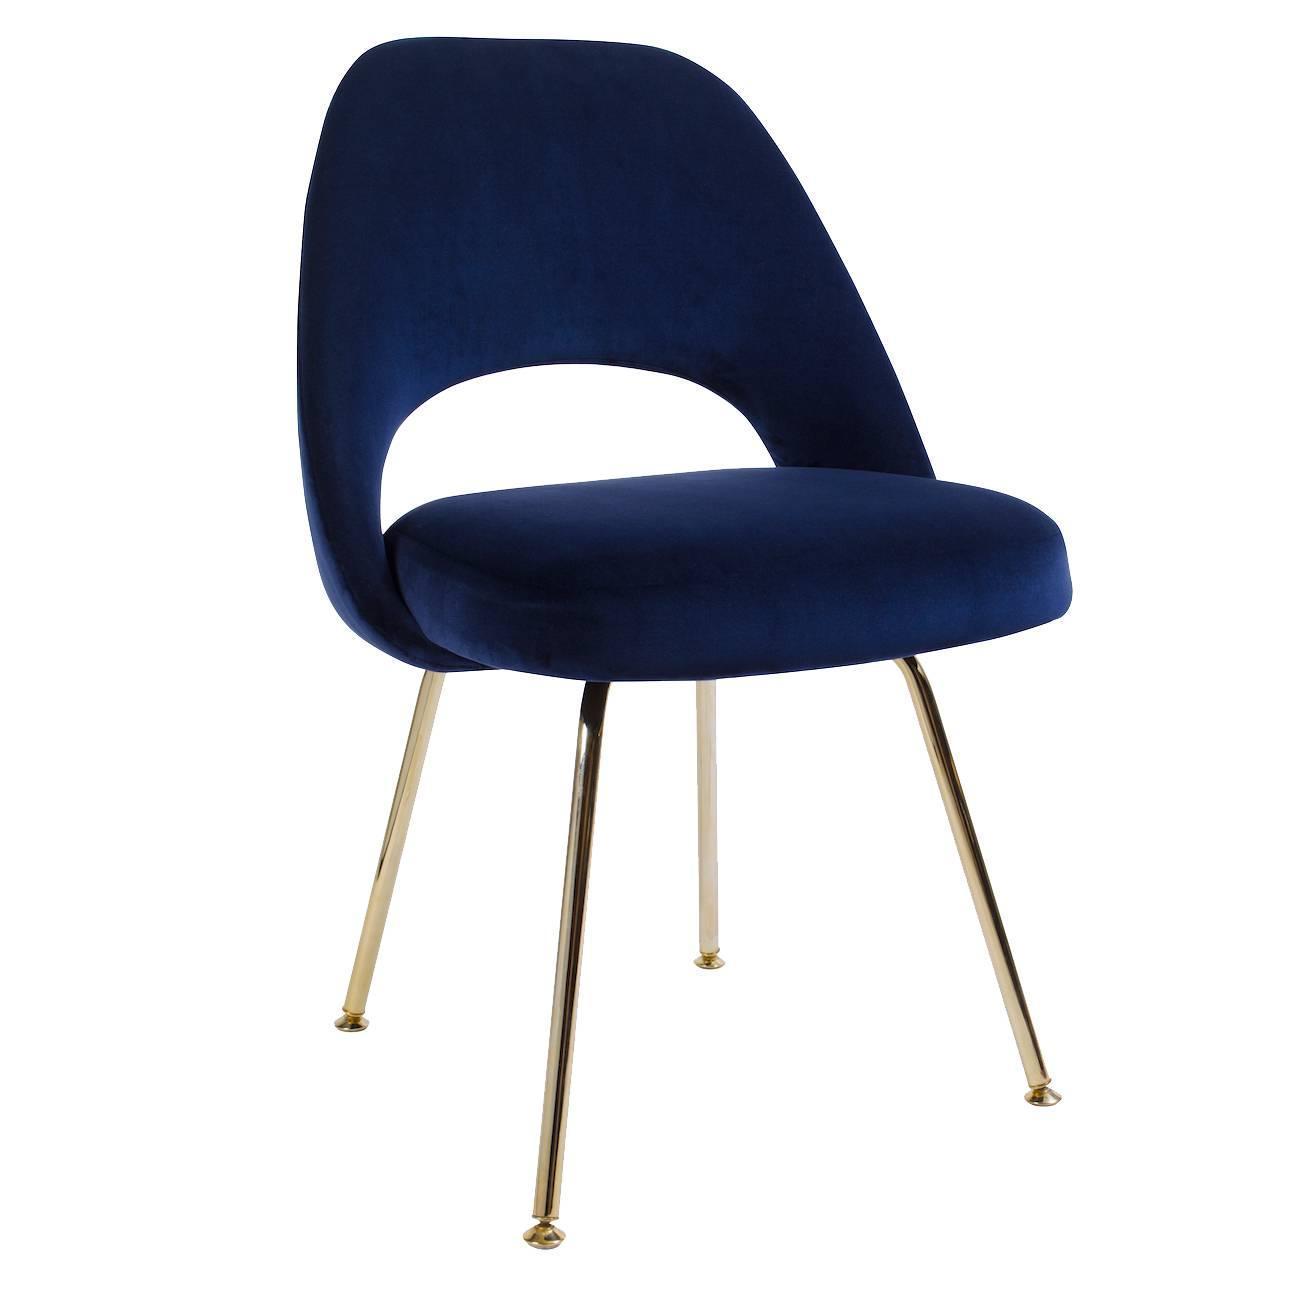 saarinen executive armless chair in navy velvet karat gold  - saarinen executive armless chair in navy velvet karat gold edition forsale at stdibs